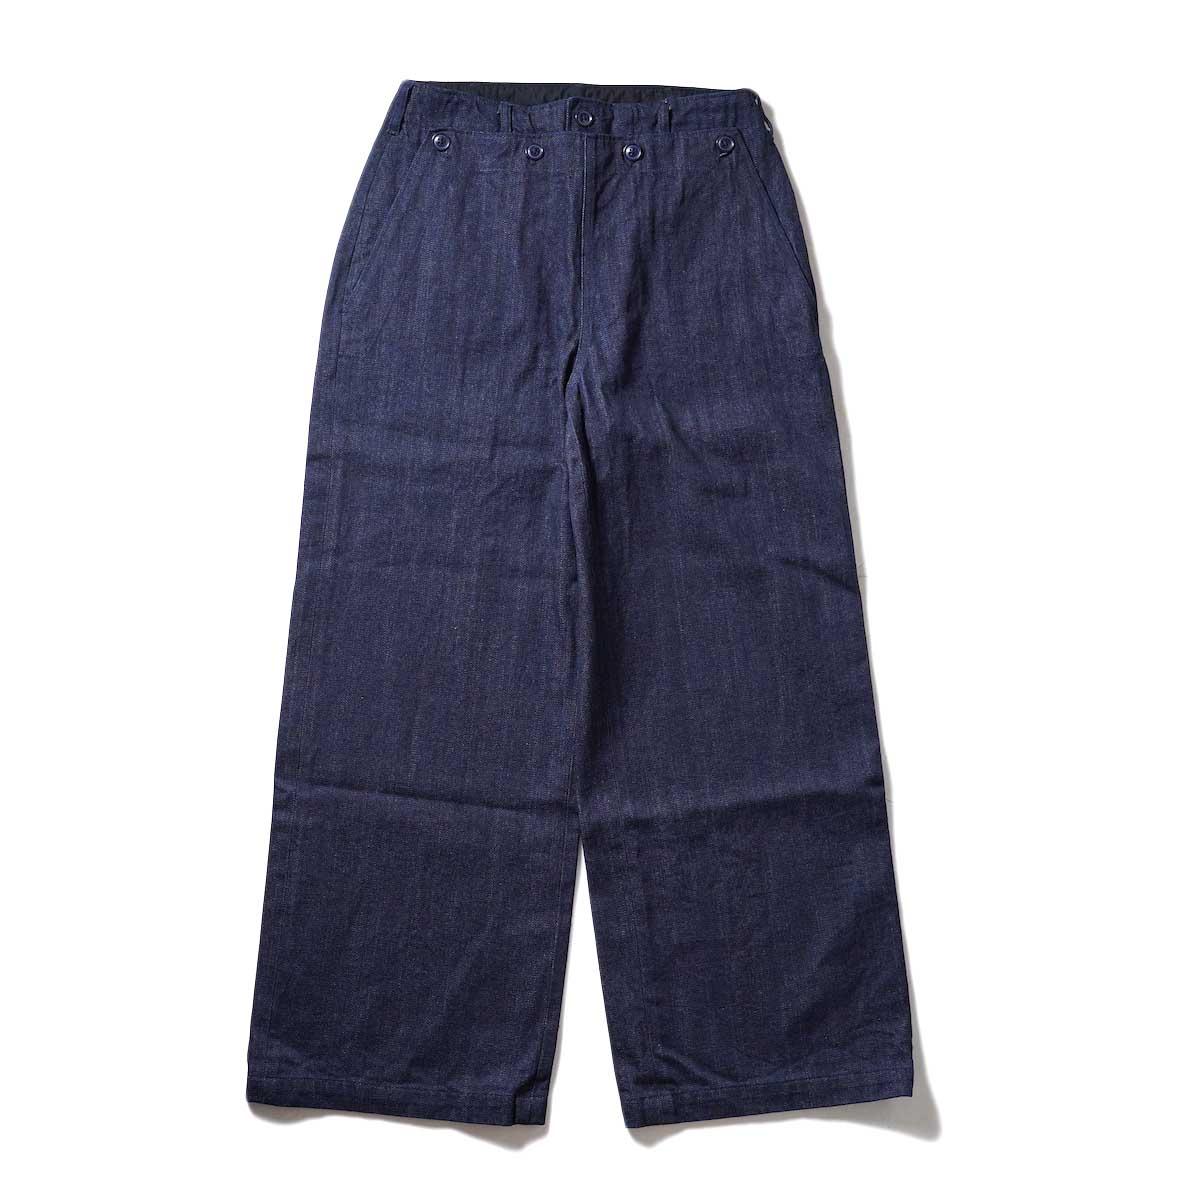 ENGINEERED GARMENTS / Sailor Pant (Indigo)